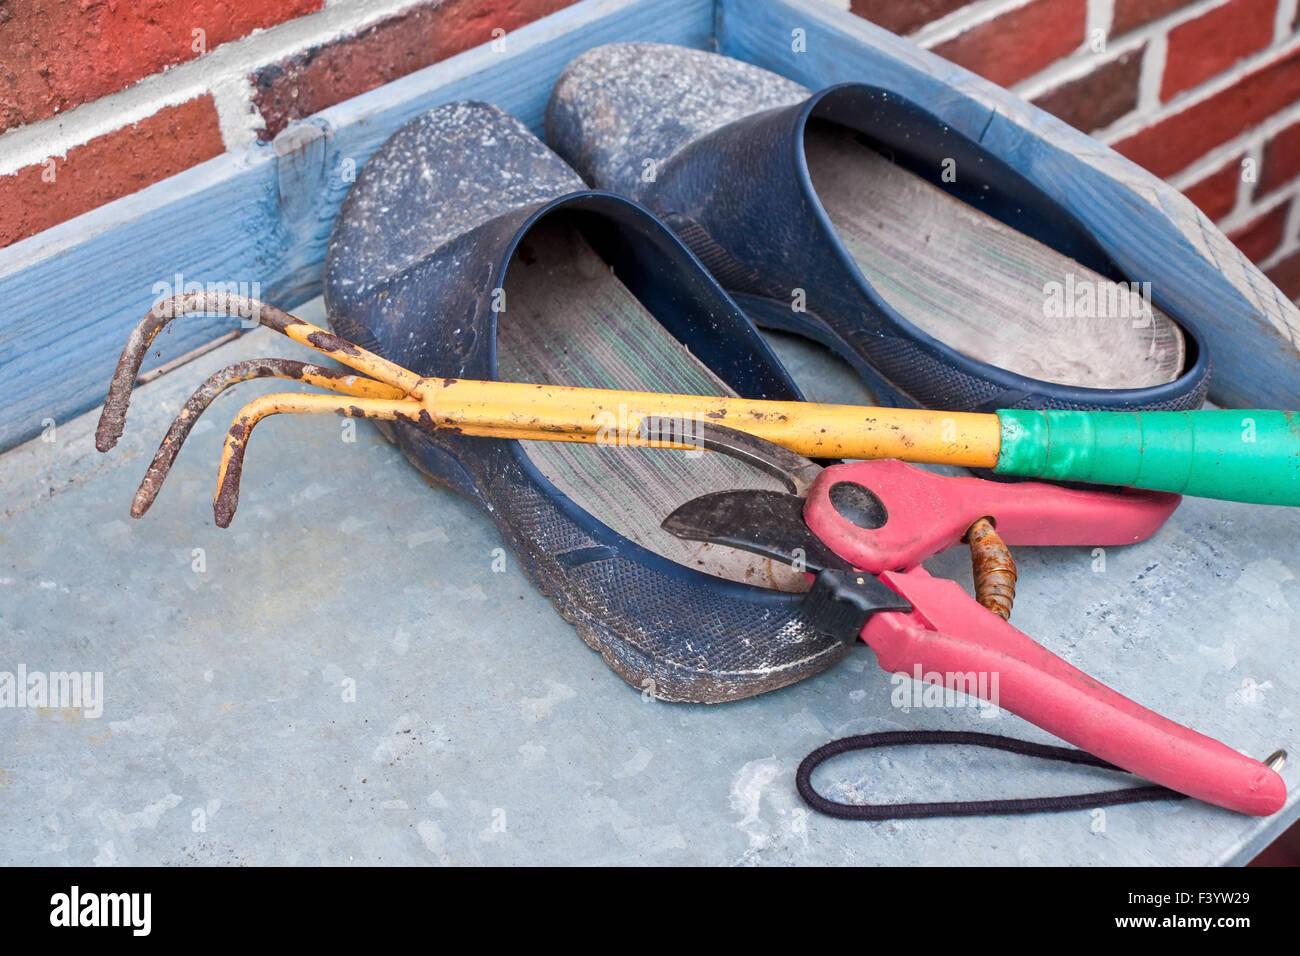 stilllife consisting of small gardening tools Stock Photo